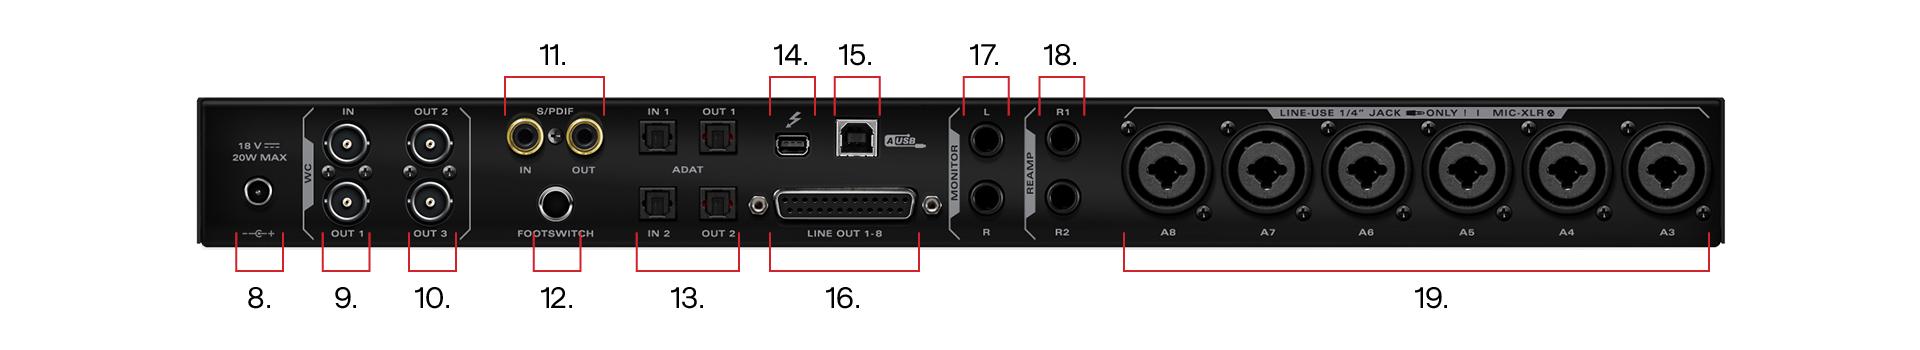 AA D8 panels2